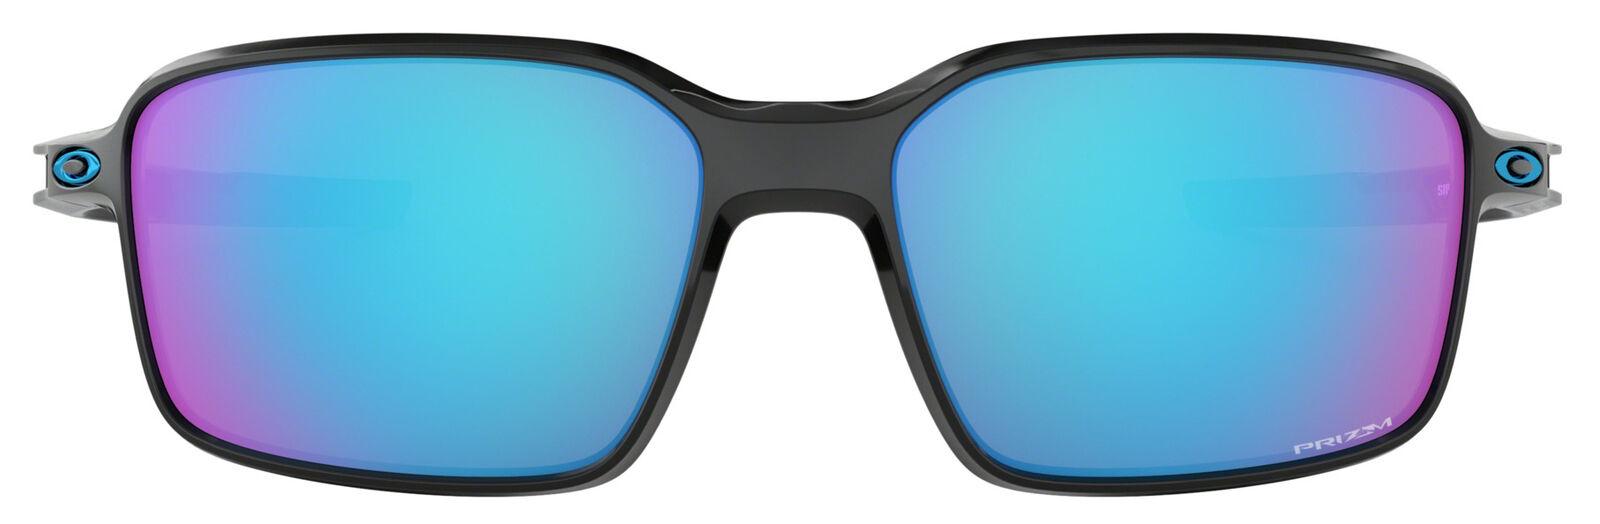 79e0844dbdd Oakley Siphon Men s Sunglasses - Polished Black Frame